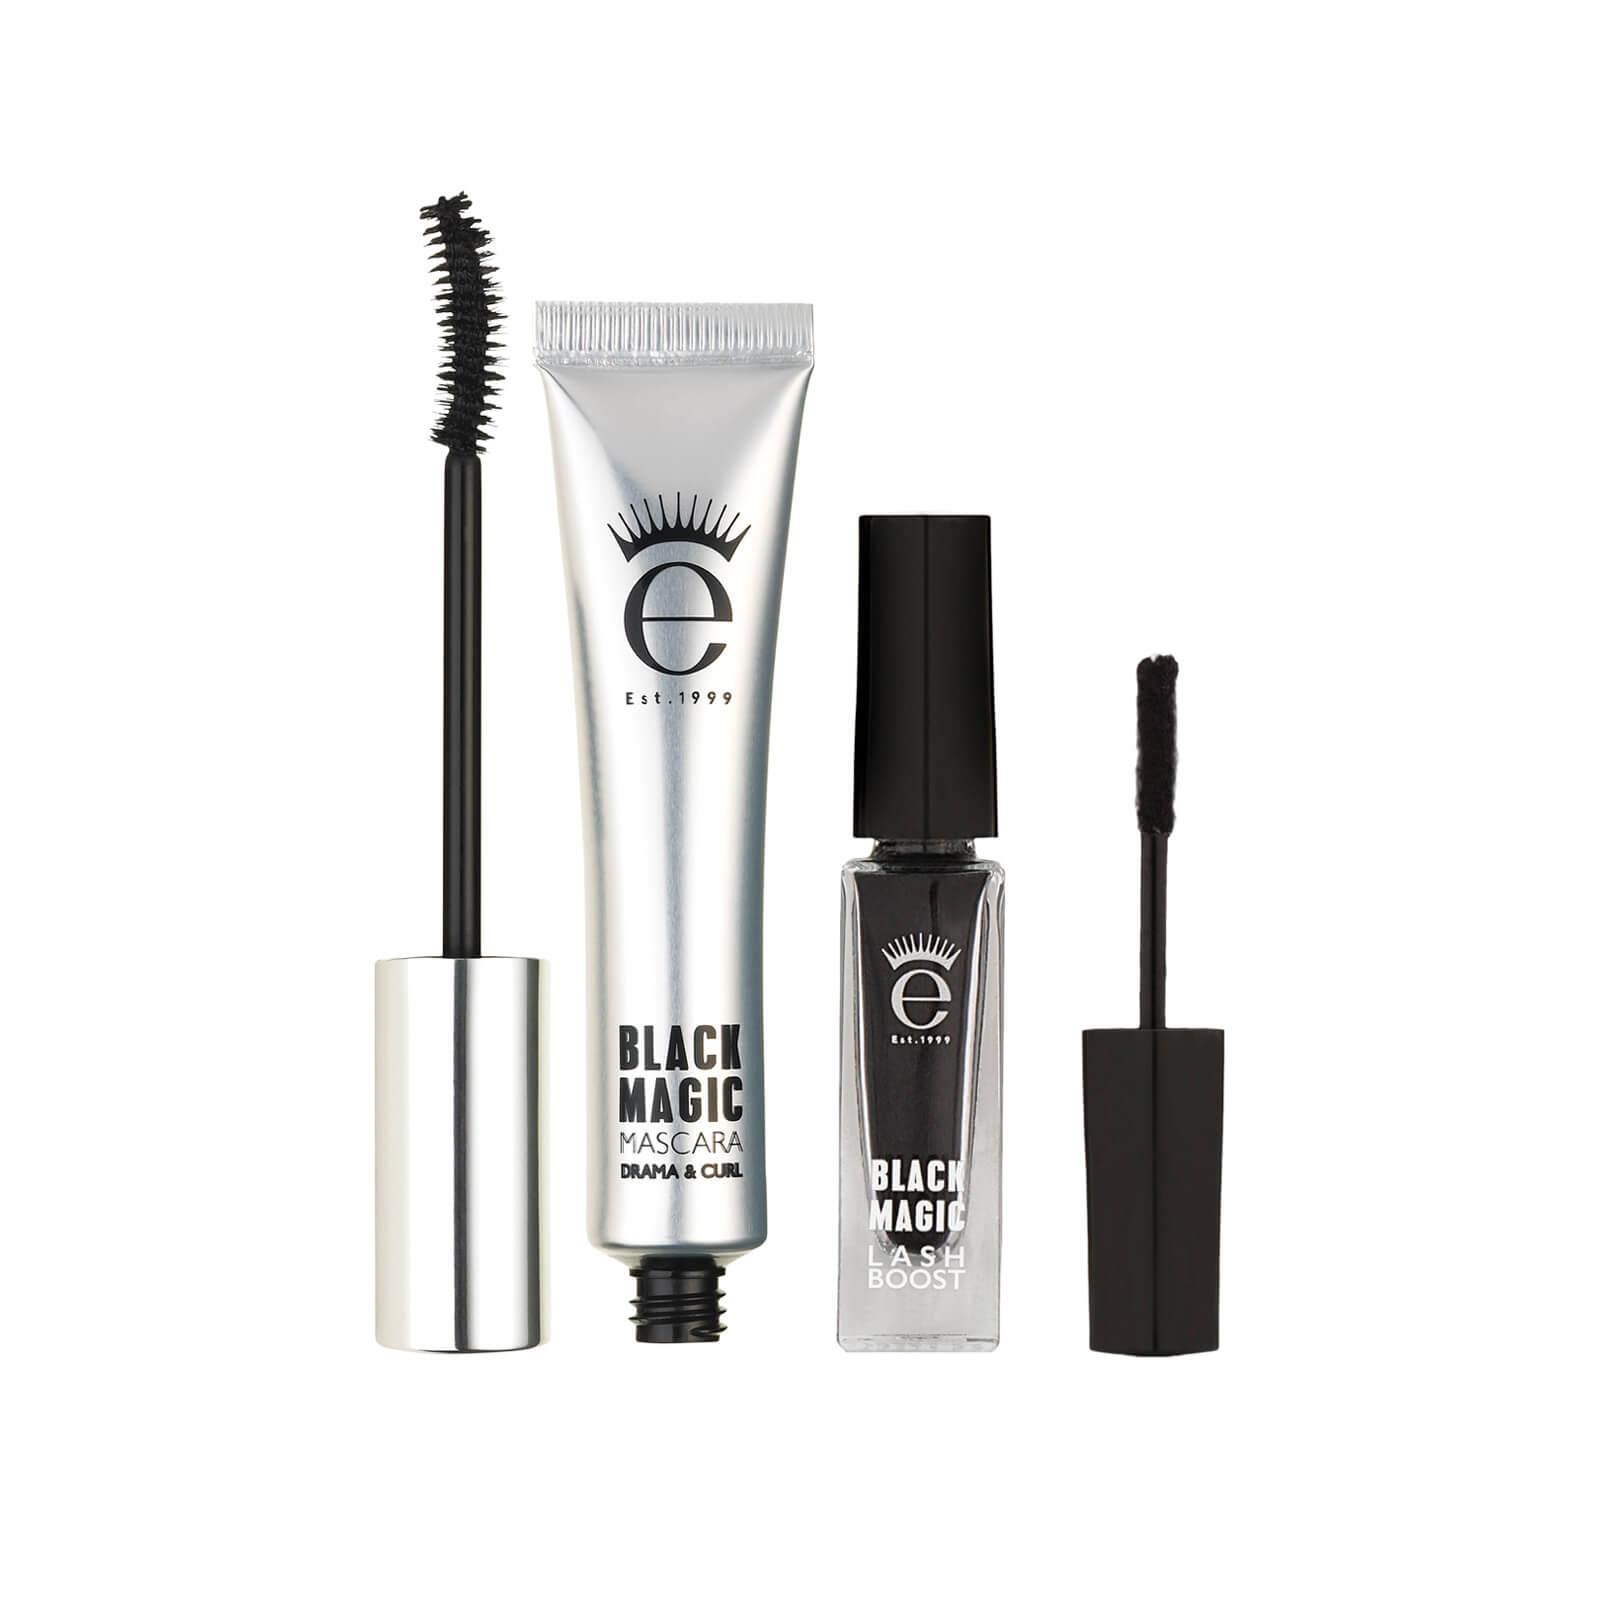 7ca432e0c70 Black Magic Mascara + Lash Boost Duo. Description